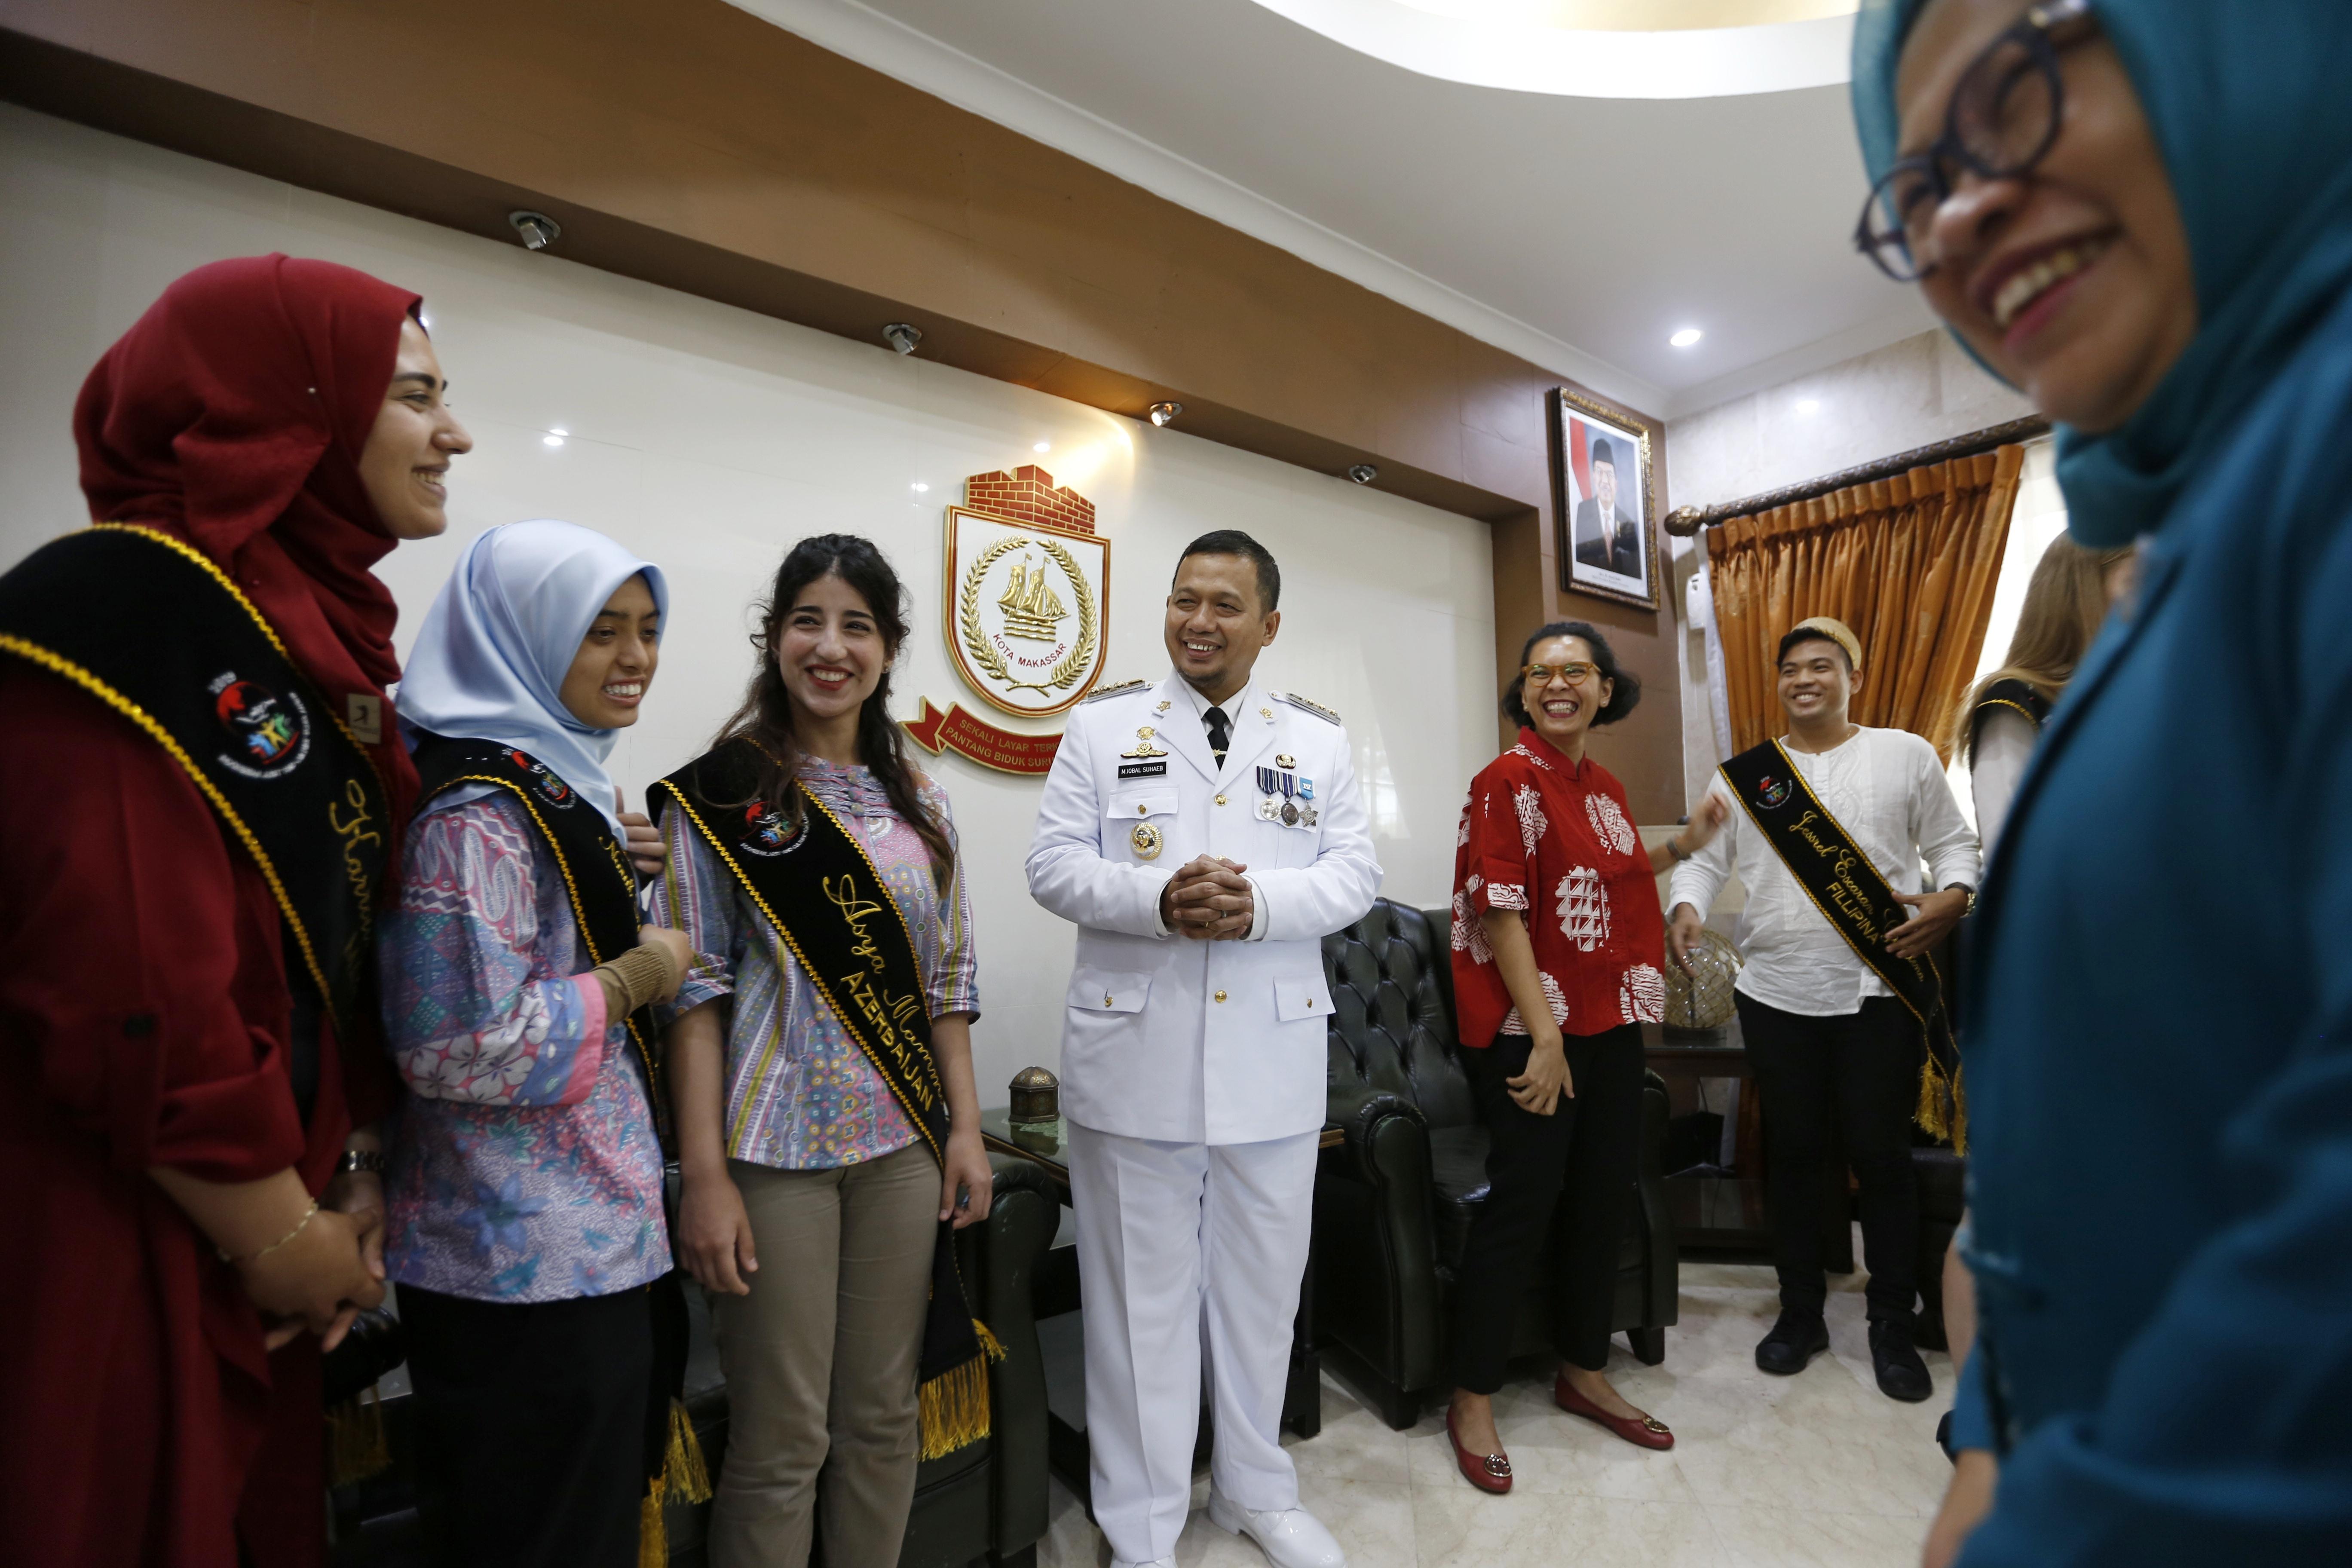 Mahasiswa Beasiswa Kemenlu Silaturahmi Bersama PJ Wali Kota Makassar